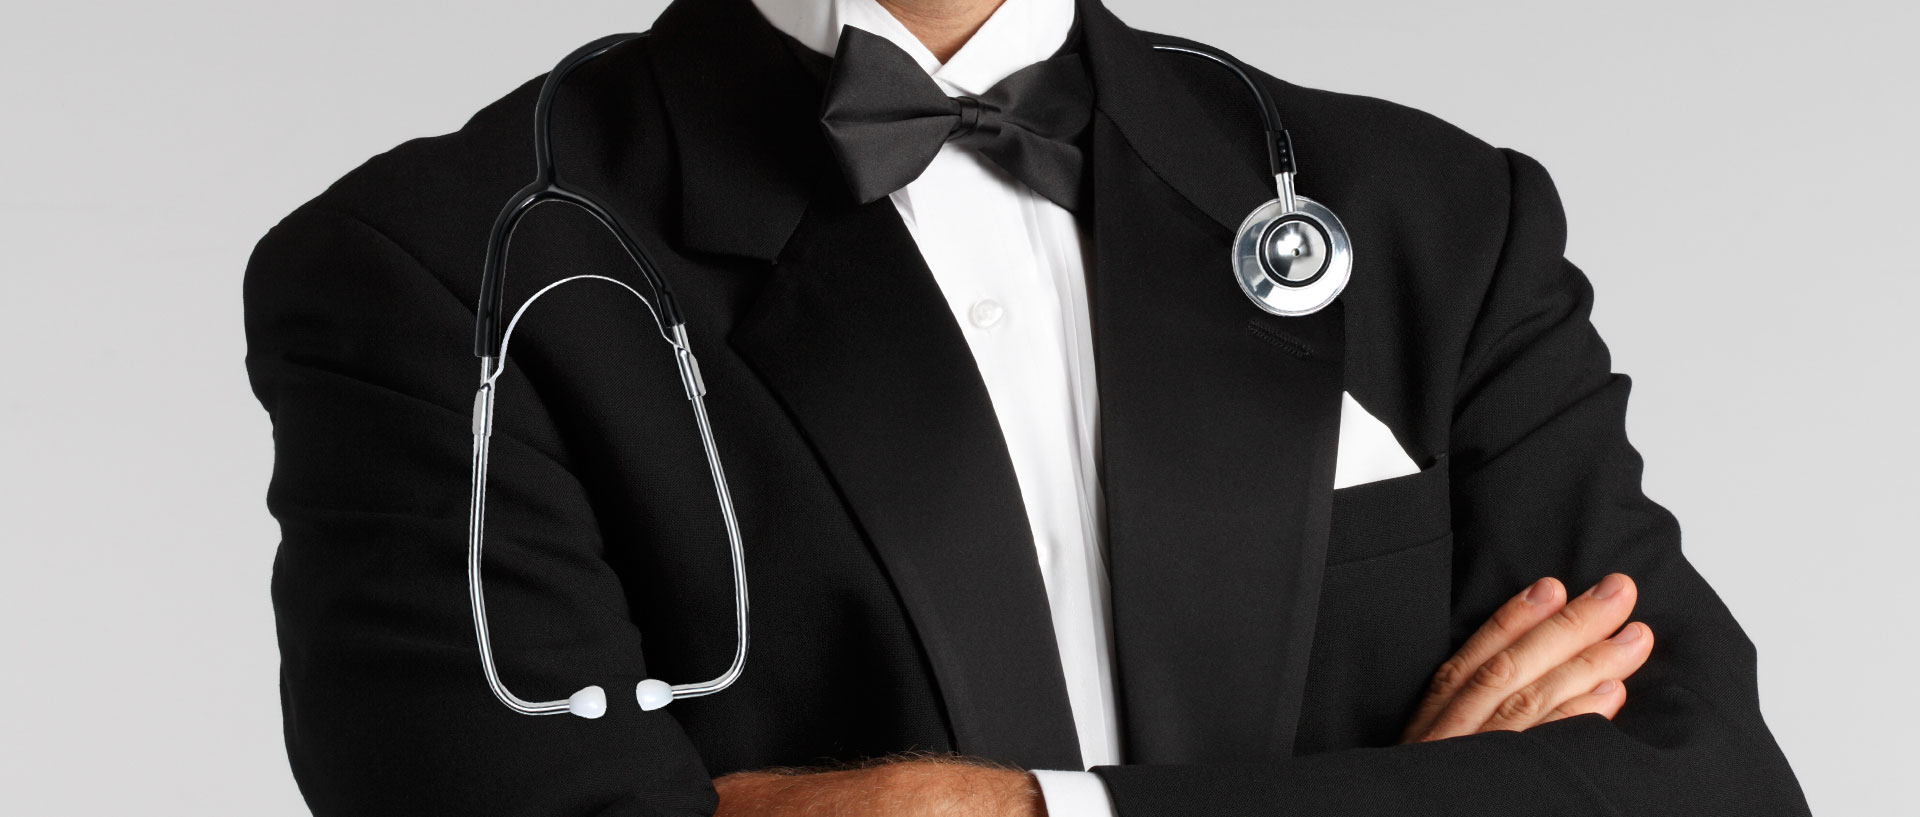 Is Concierge Medicine Worth the Extra Cost  Consumer